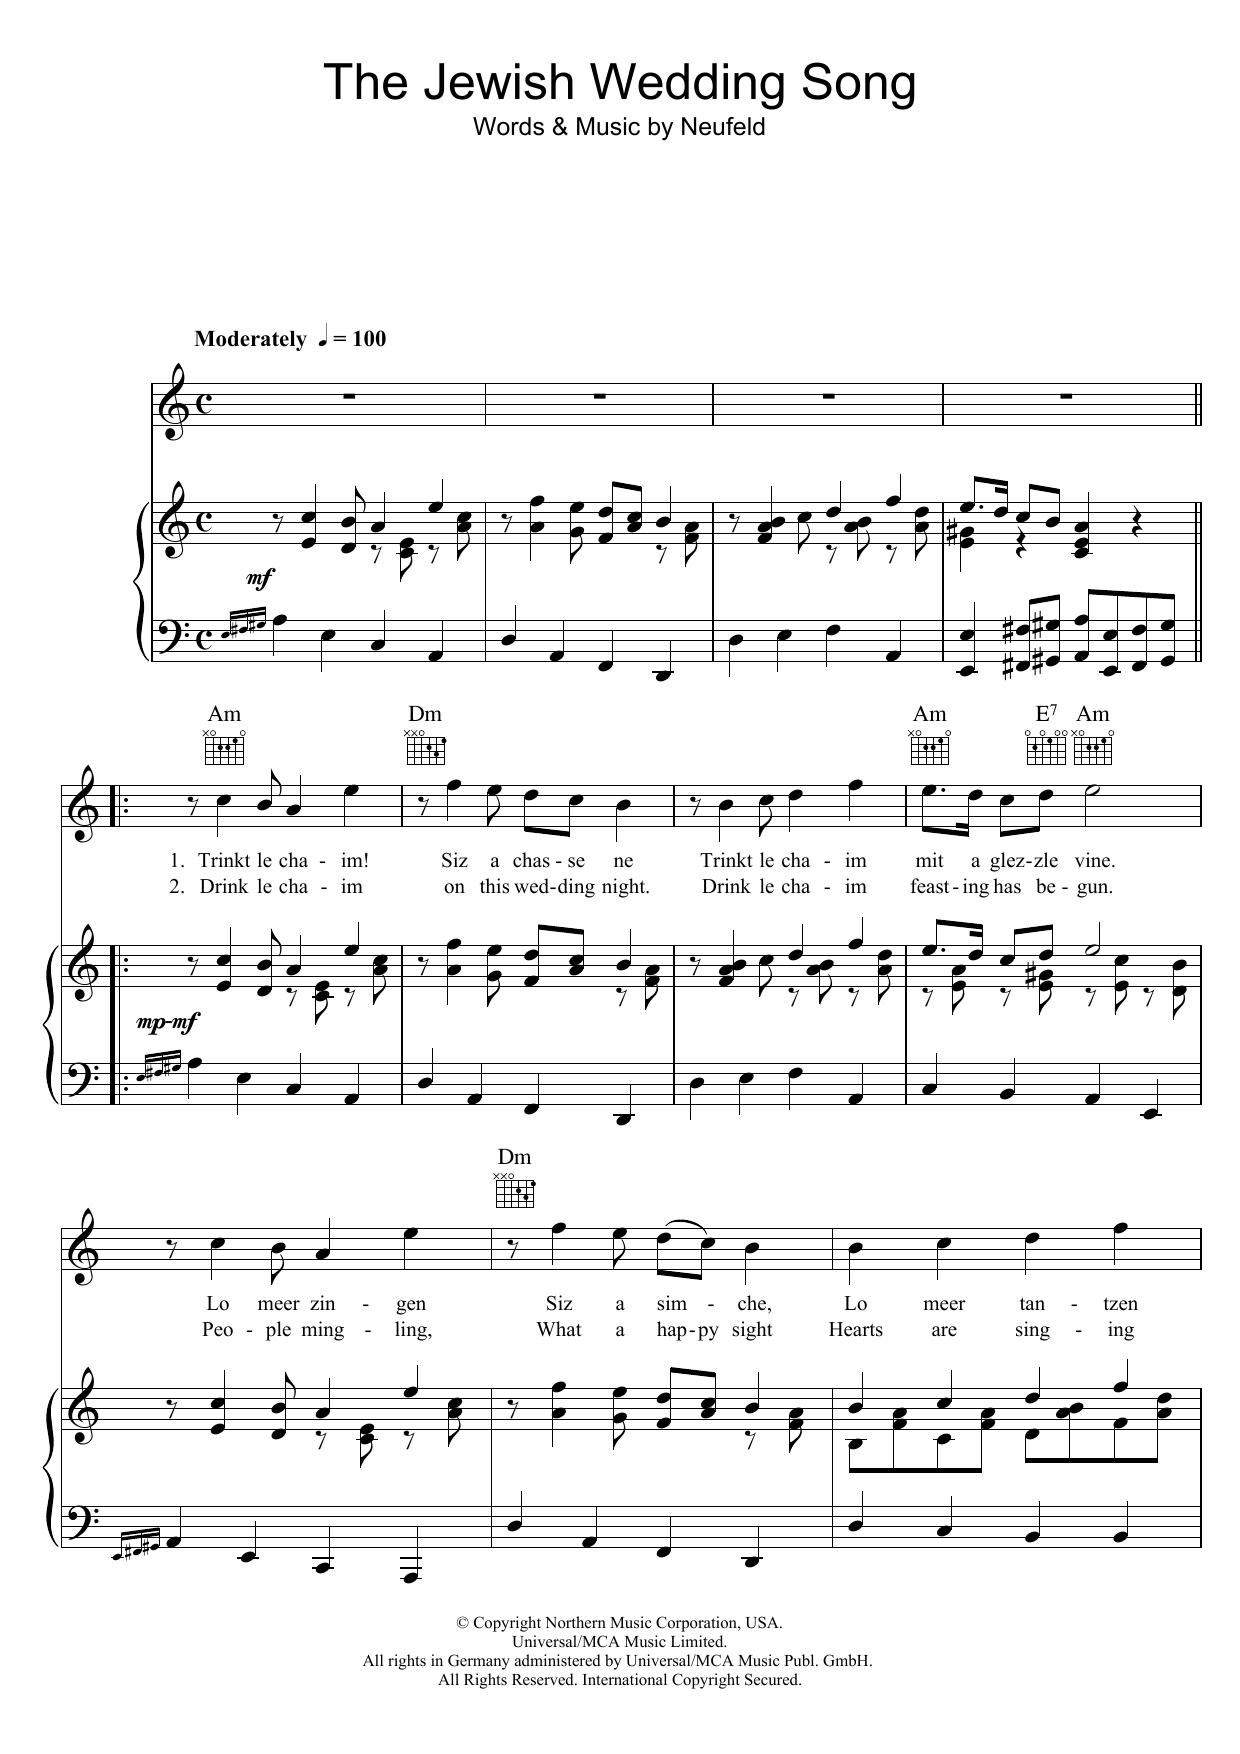 Julie Andrews - The Jewish Wedding Song